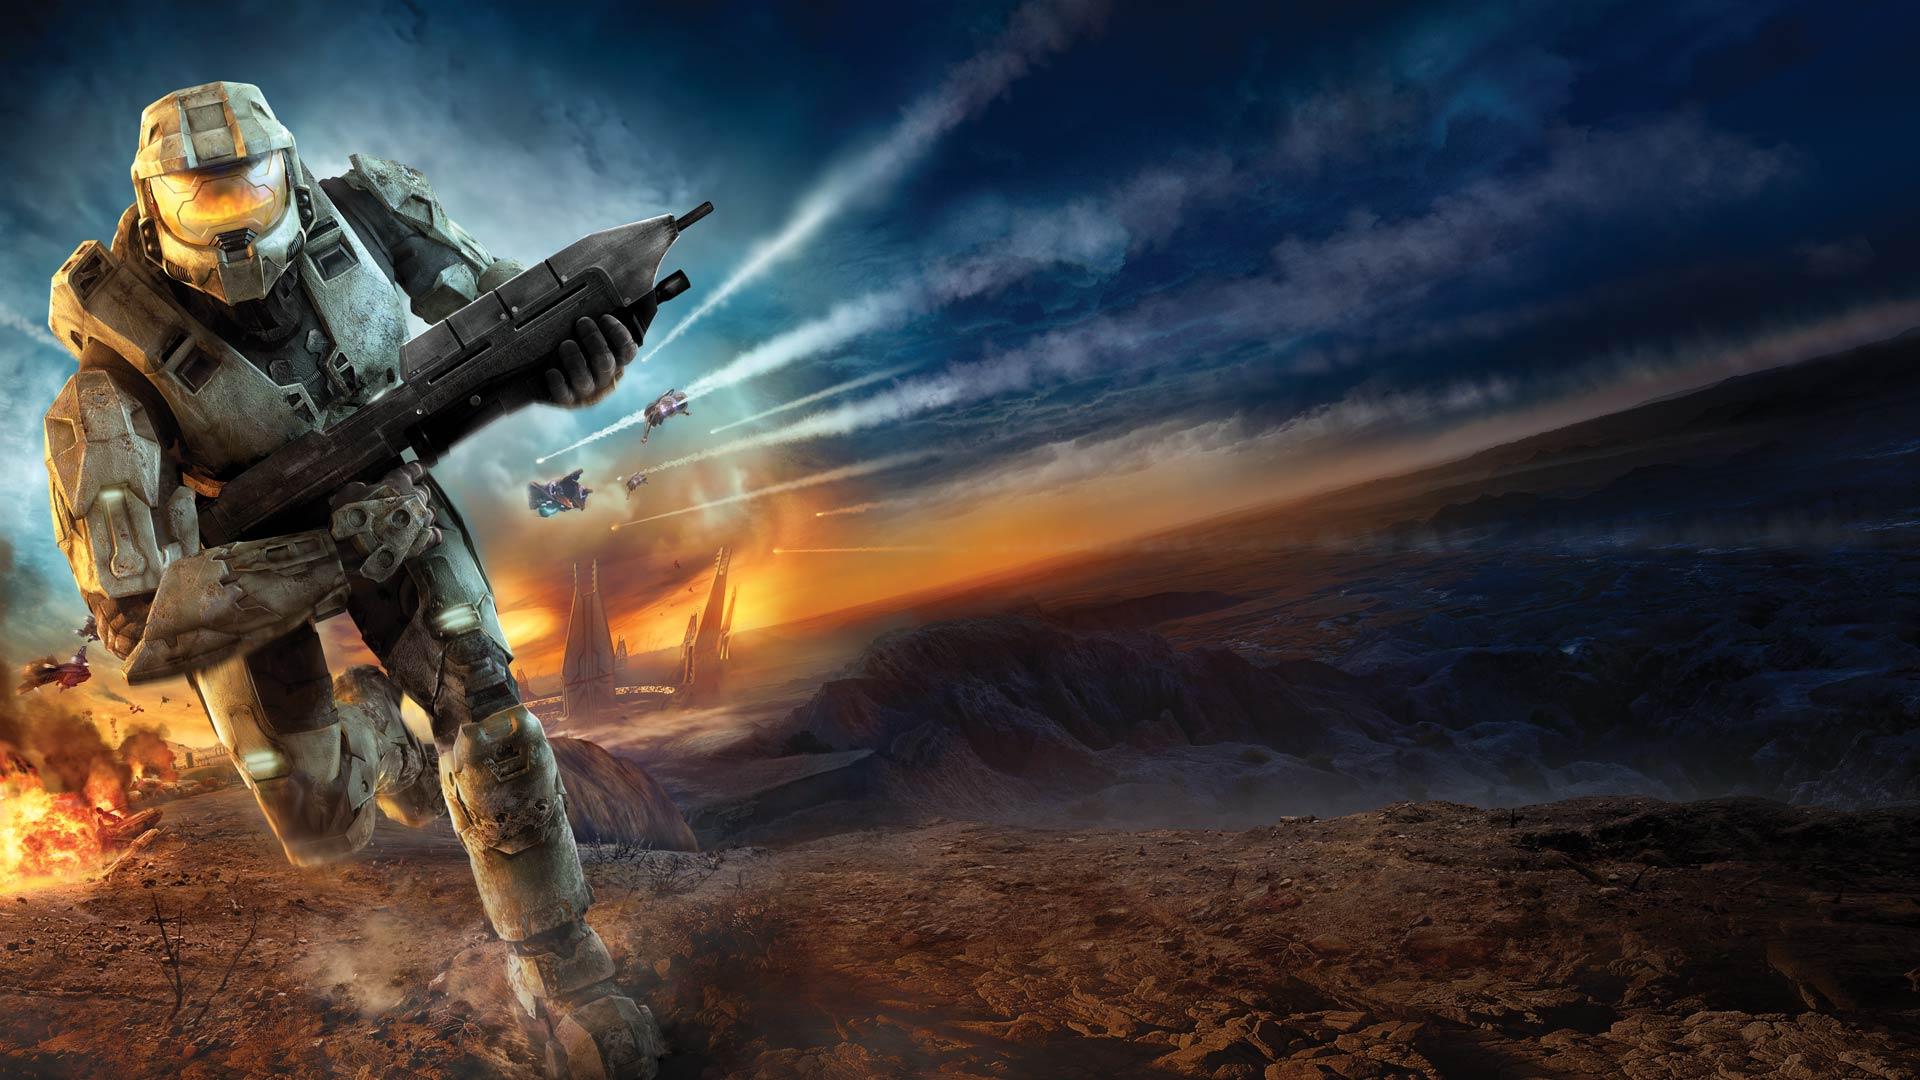 Halo Wallpaper Widescreen Downloads